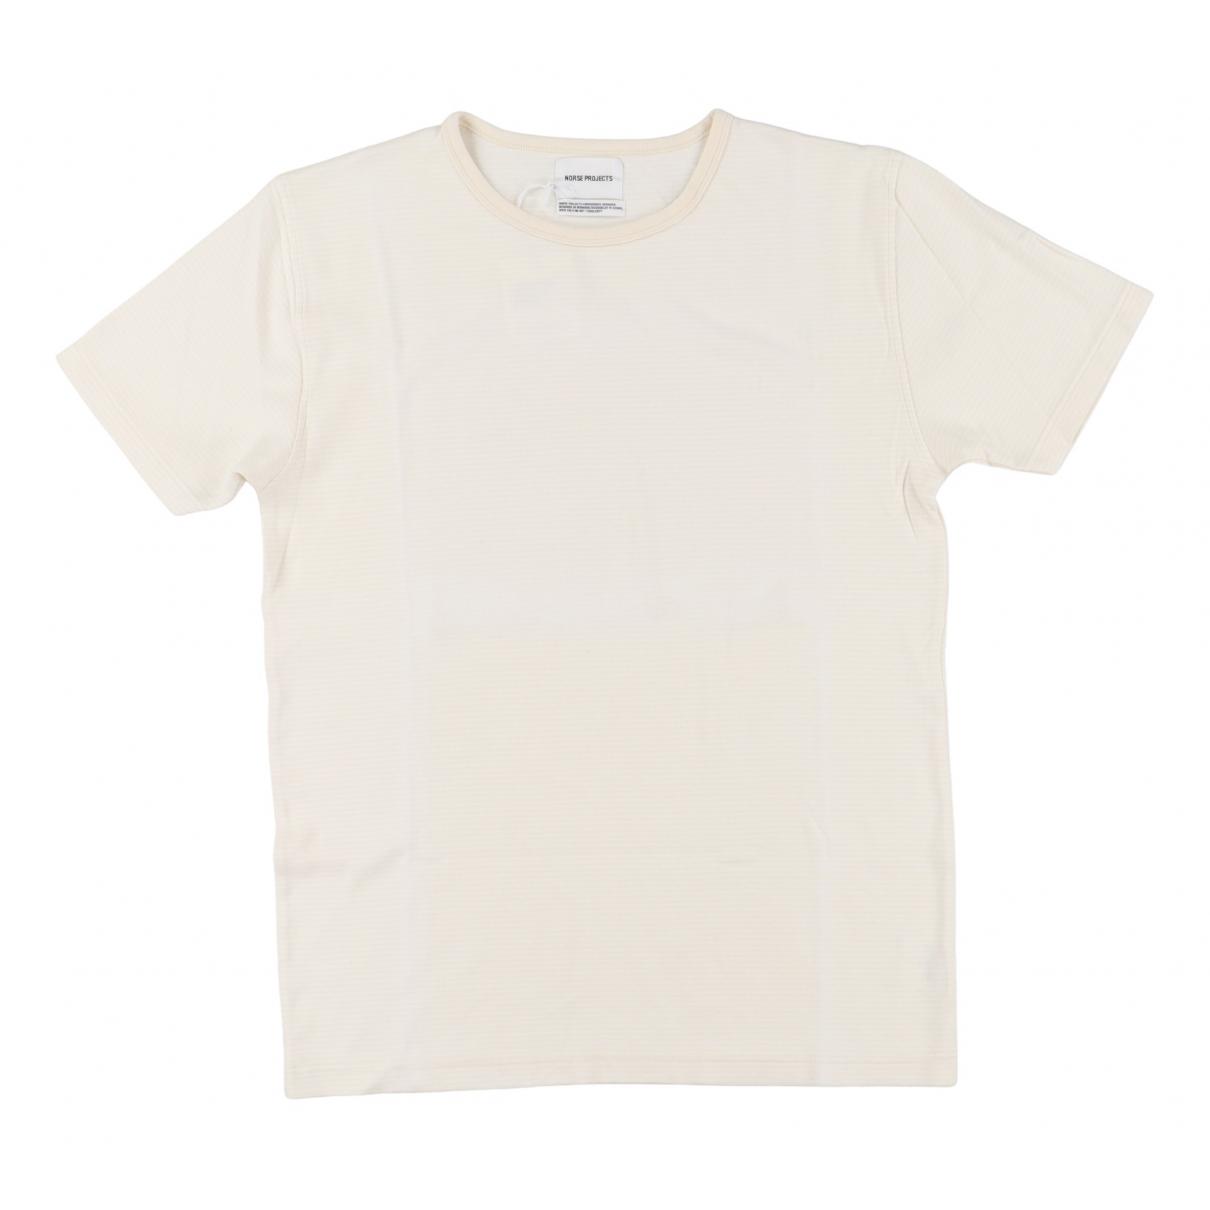 Norse Projects - Tee shirts   pour homme en coton - blanc